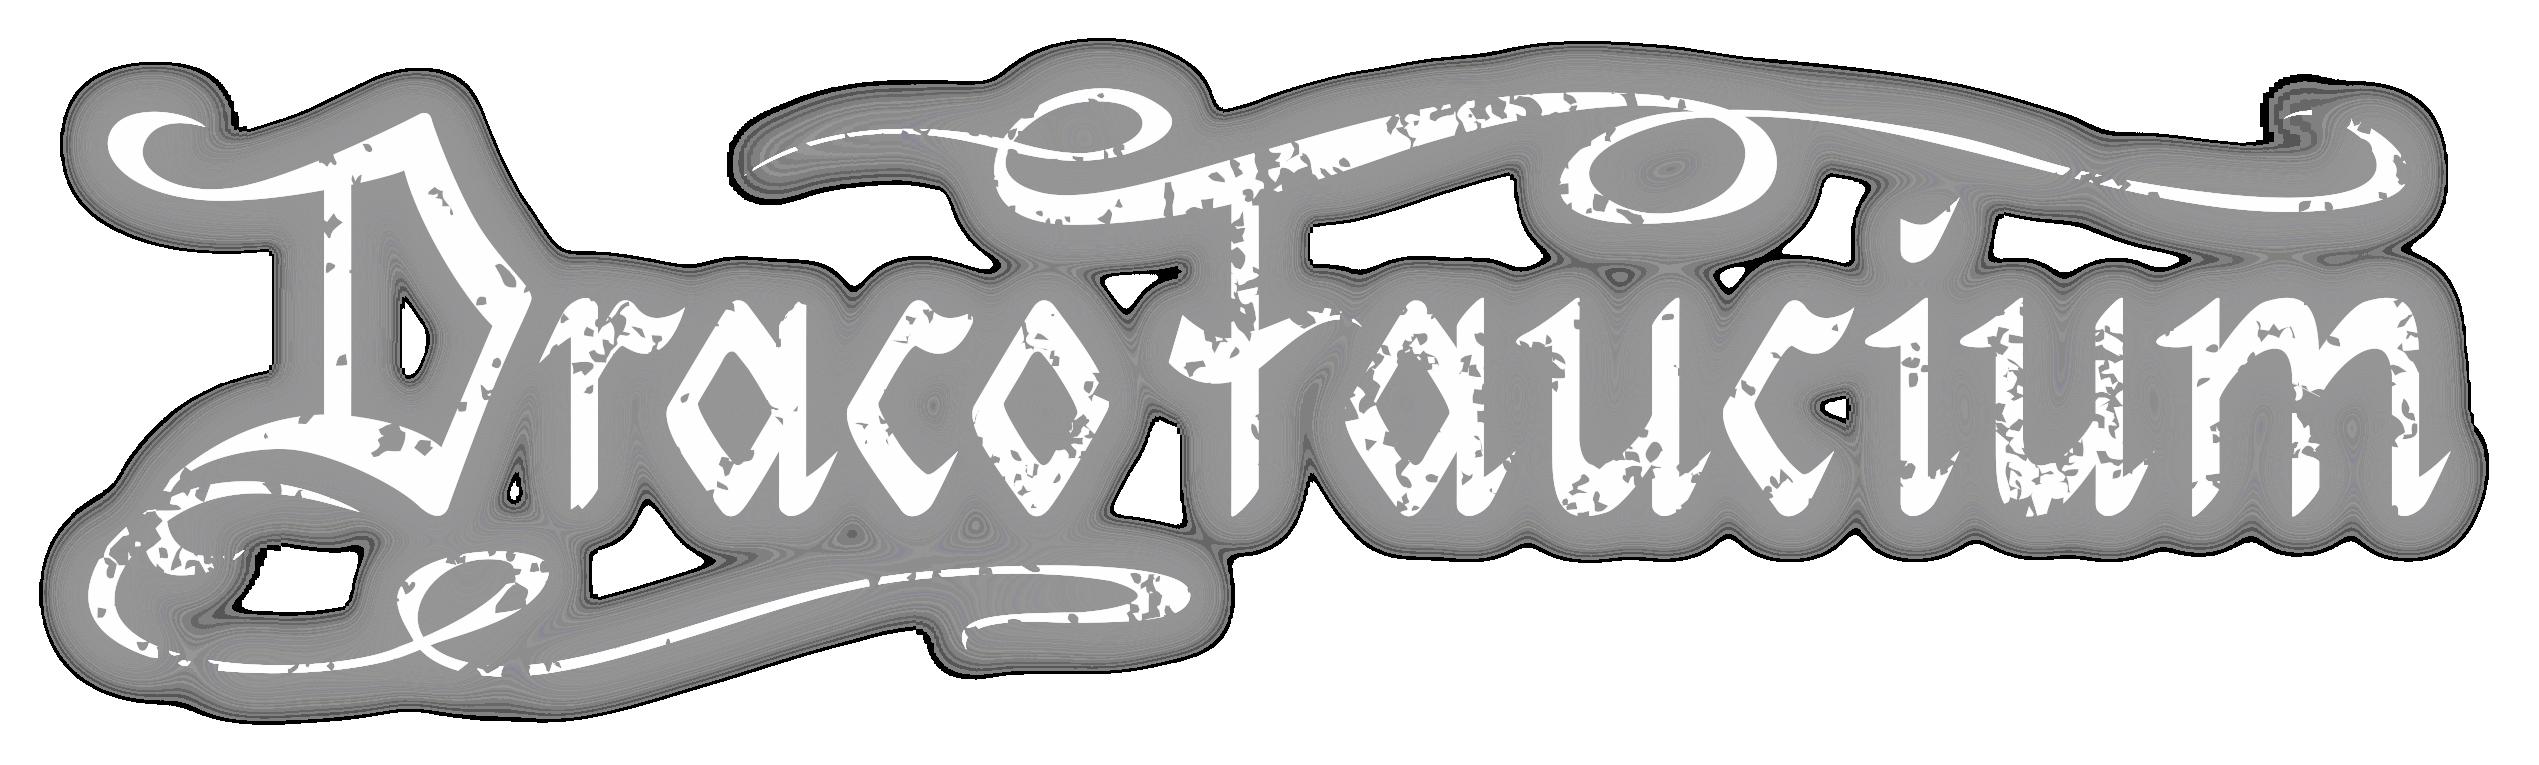 Draco Faucium Mittelalterrock Band Sachsen Erzgebirge Logotext